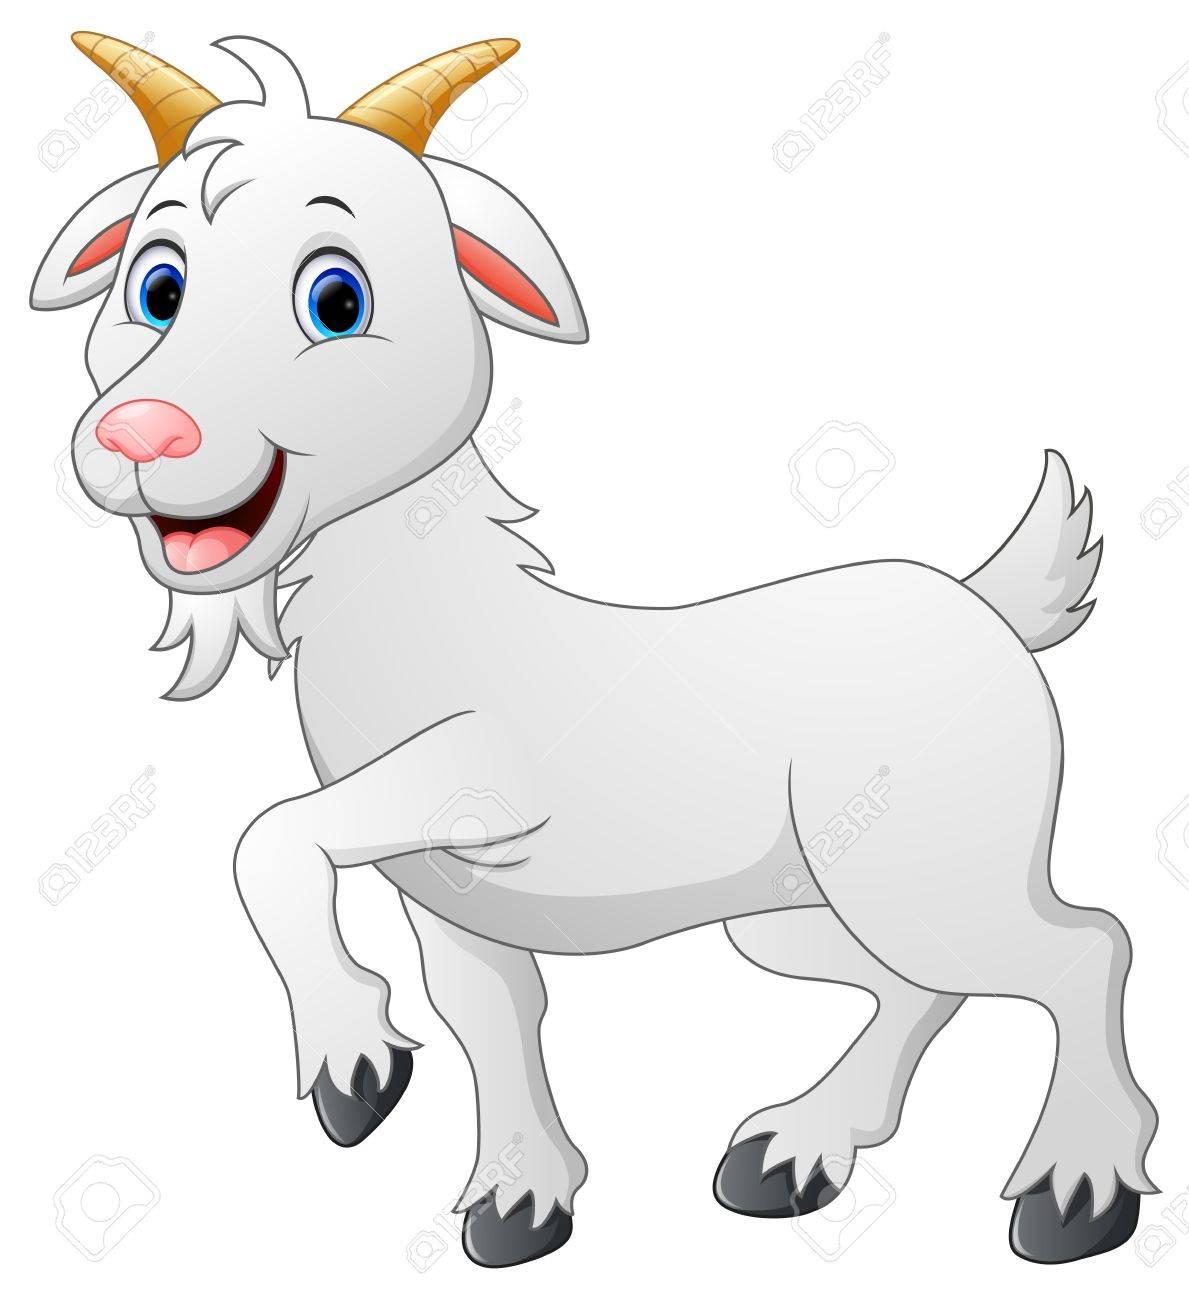 cartoon goat character royalty free cliparts vectors and stock rh 123rf com mountain goat cartoon pictures cute goat cartoon pictures